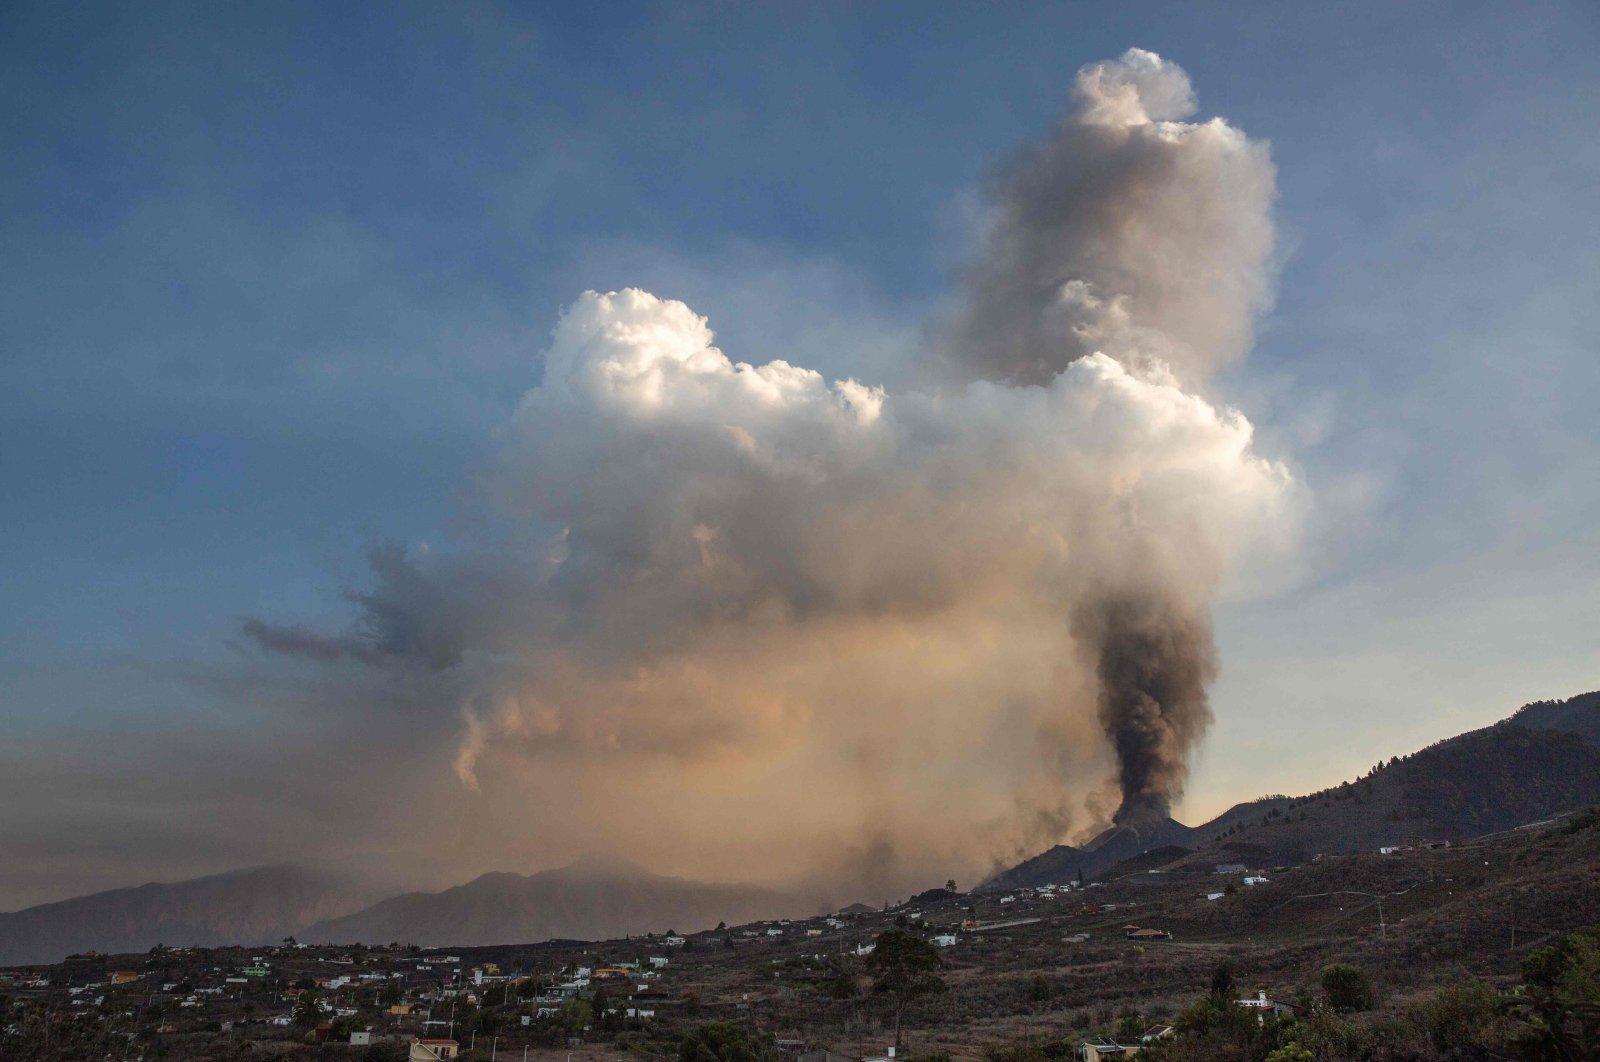 The Cumbre Vieja volcano is seen from Los Llanos de Aridane on the Canary island of La Palma, Sept. 25, 2021. (AFP Photo)